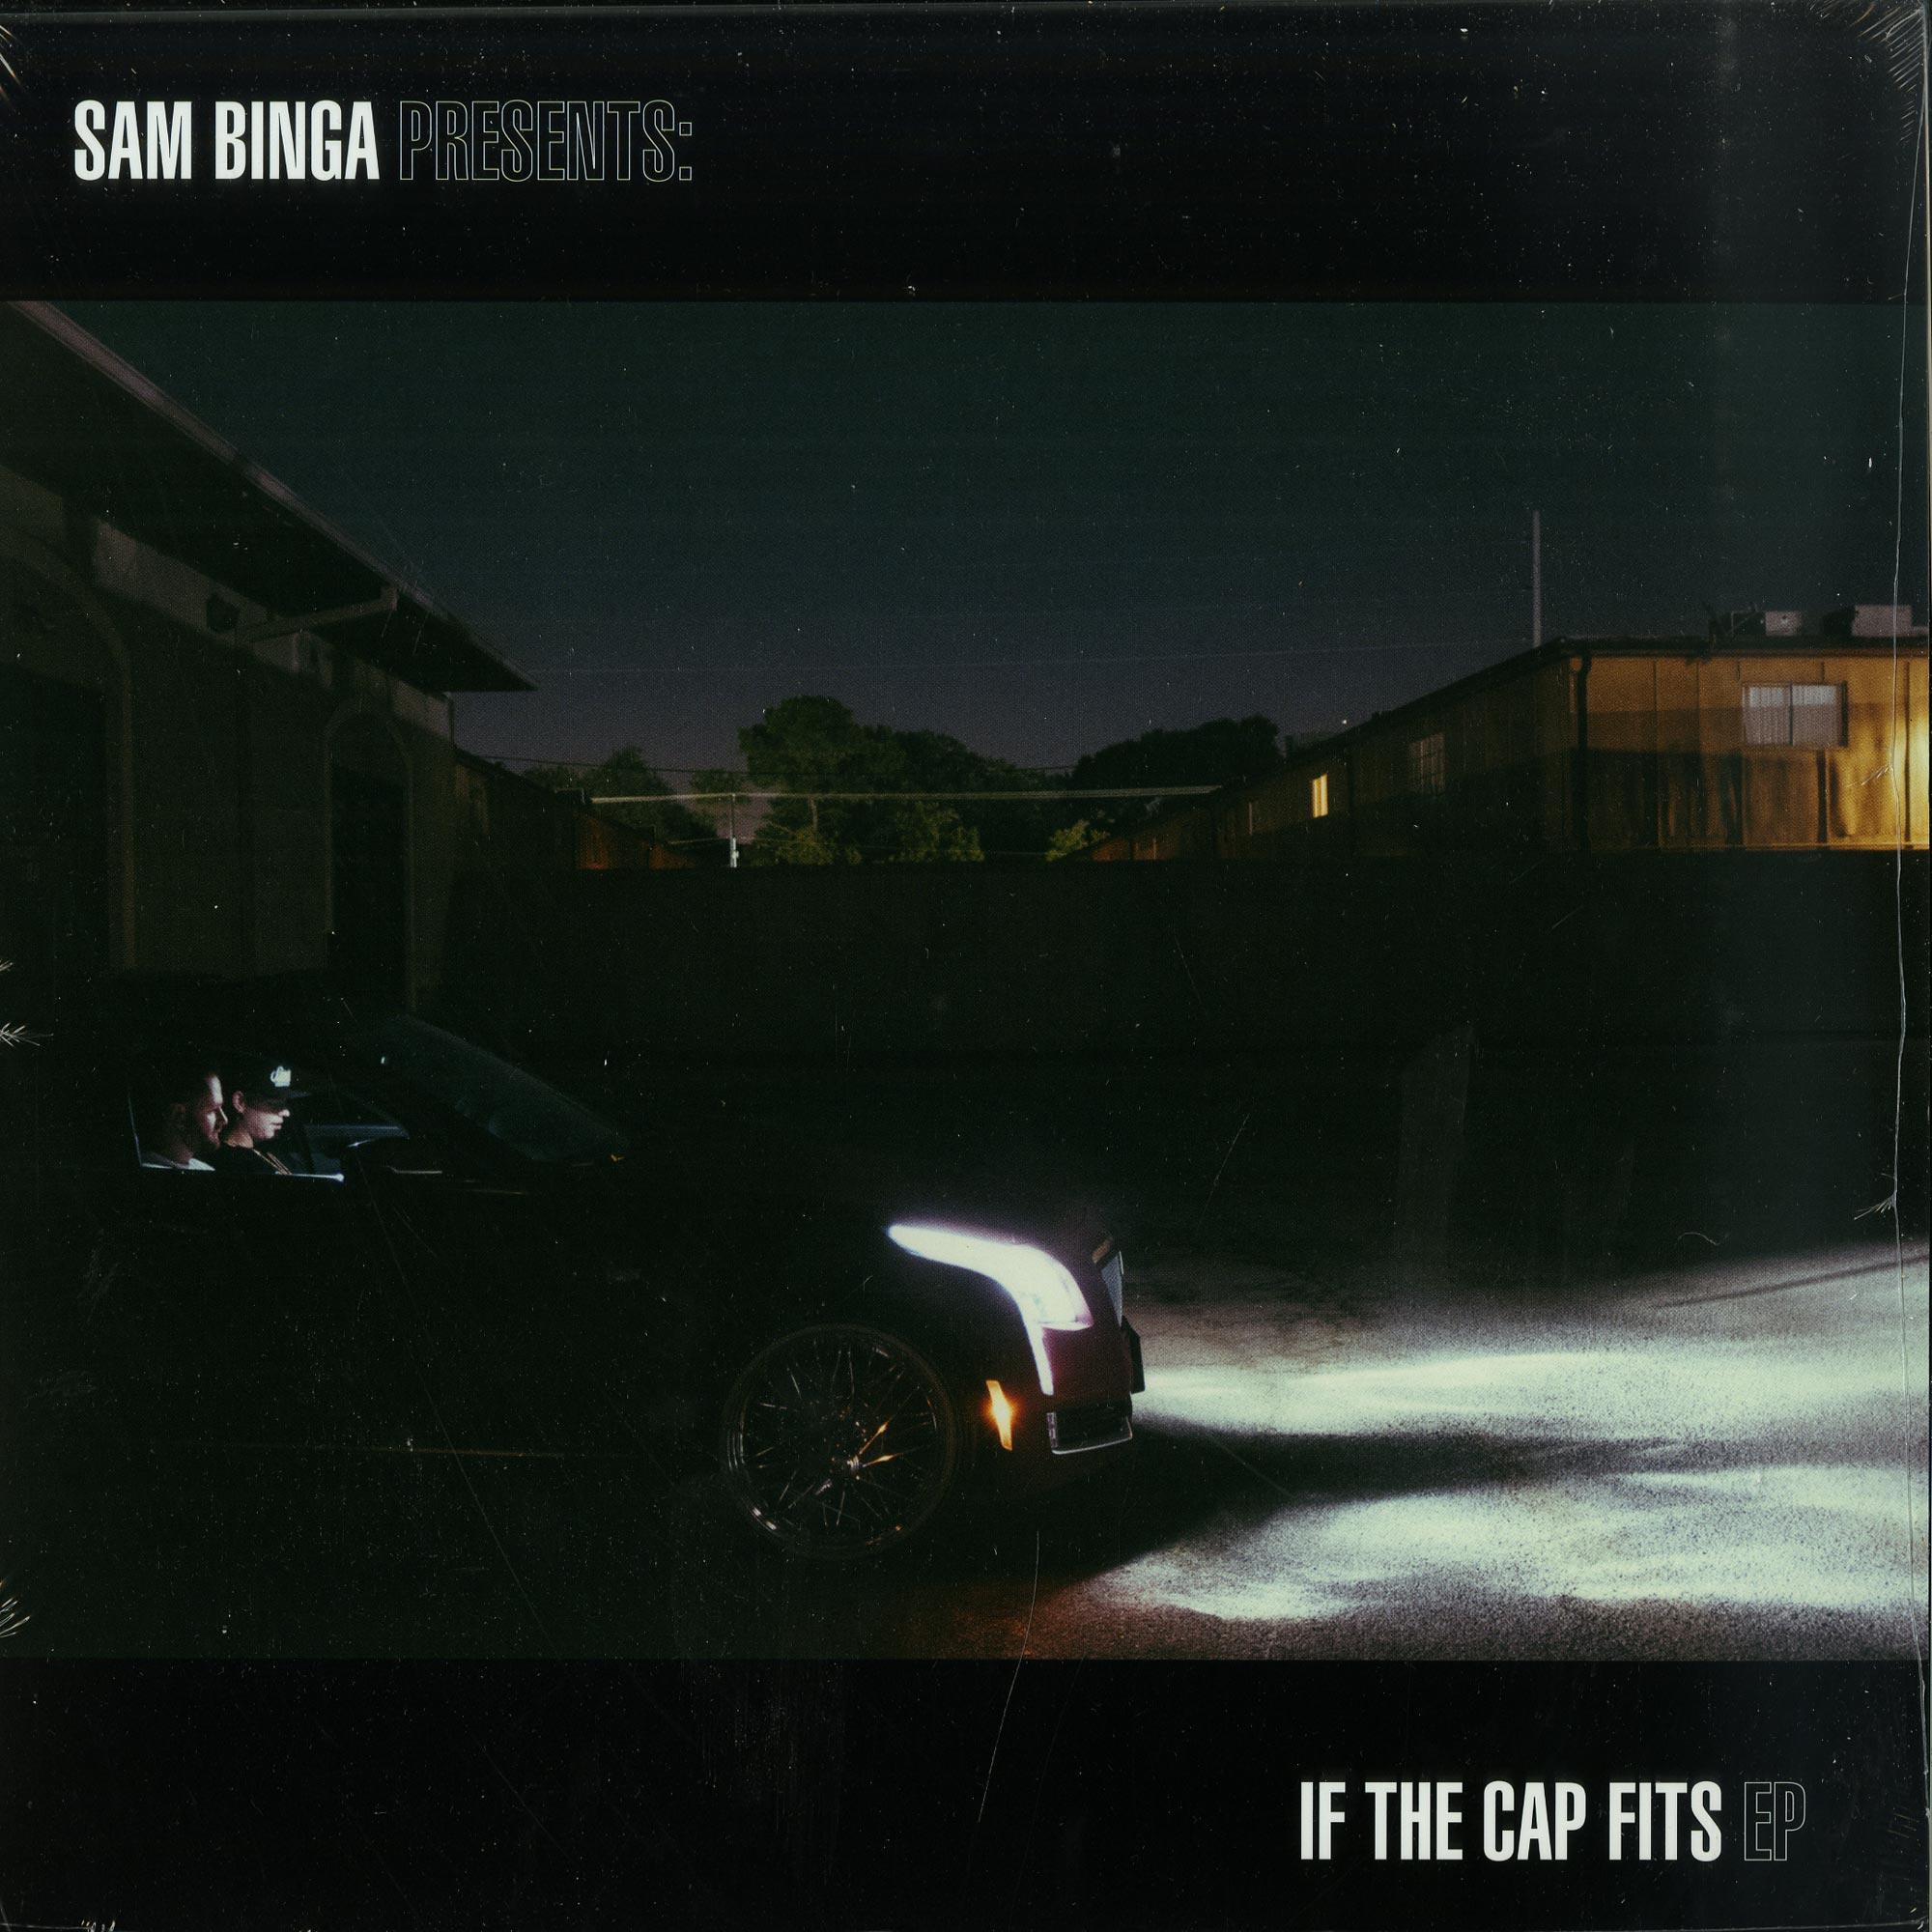 Sam Binga & more - IF THE CAP FITS